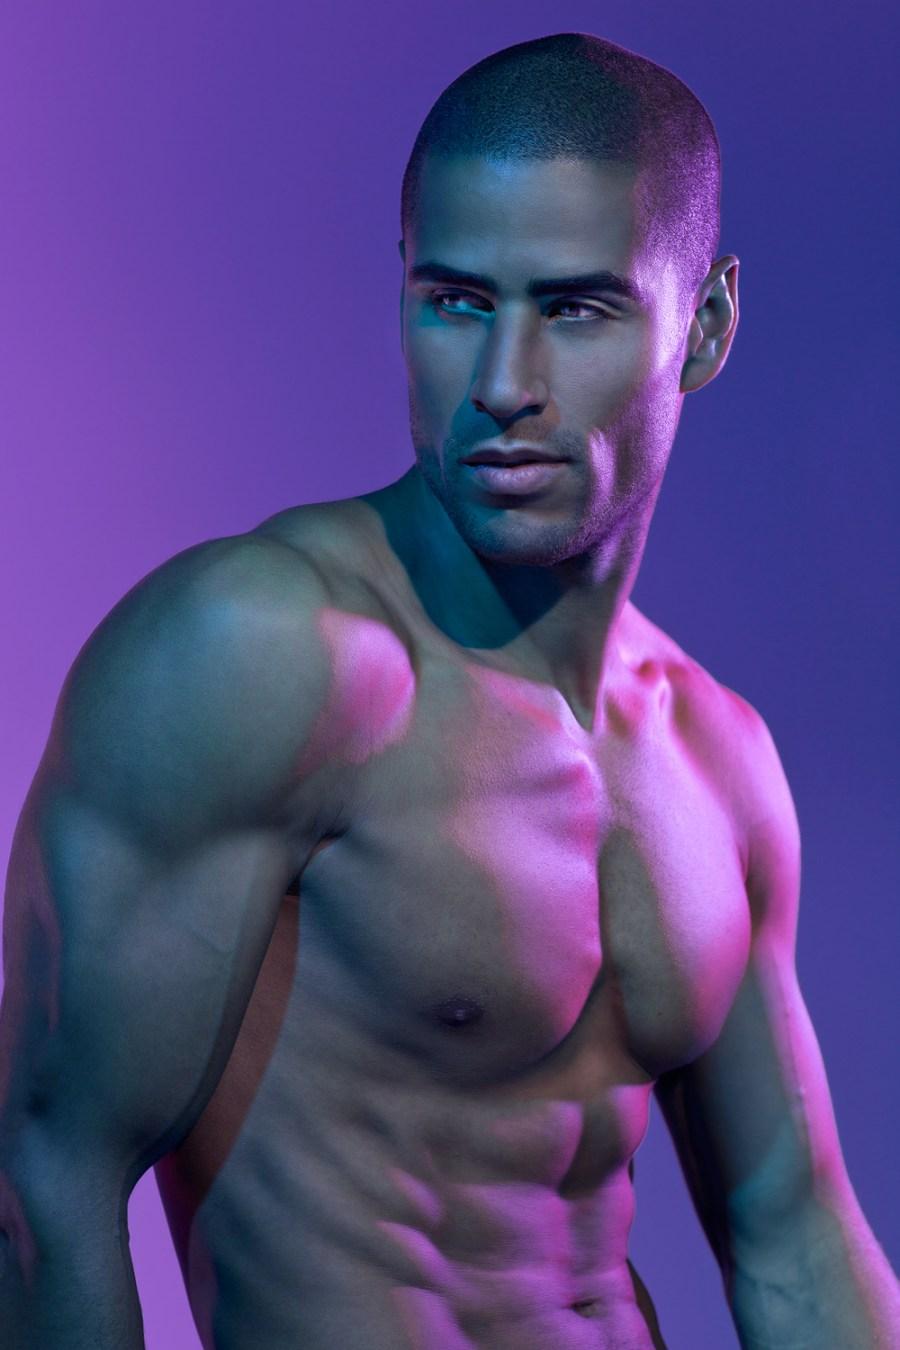 jono-photography_darnel-williams_color-study_001